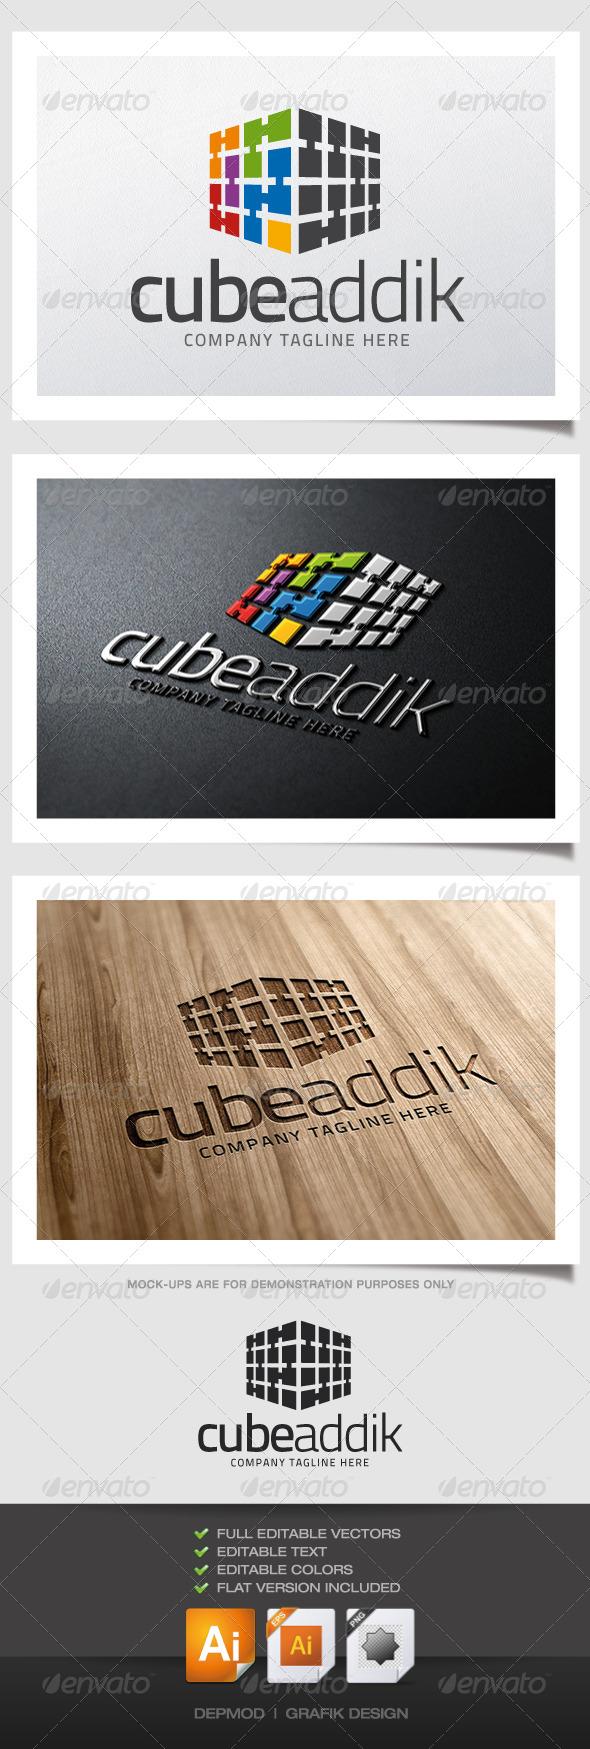 GraphicRiver Cube Addik Logo 5141280